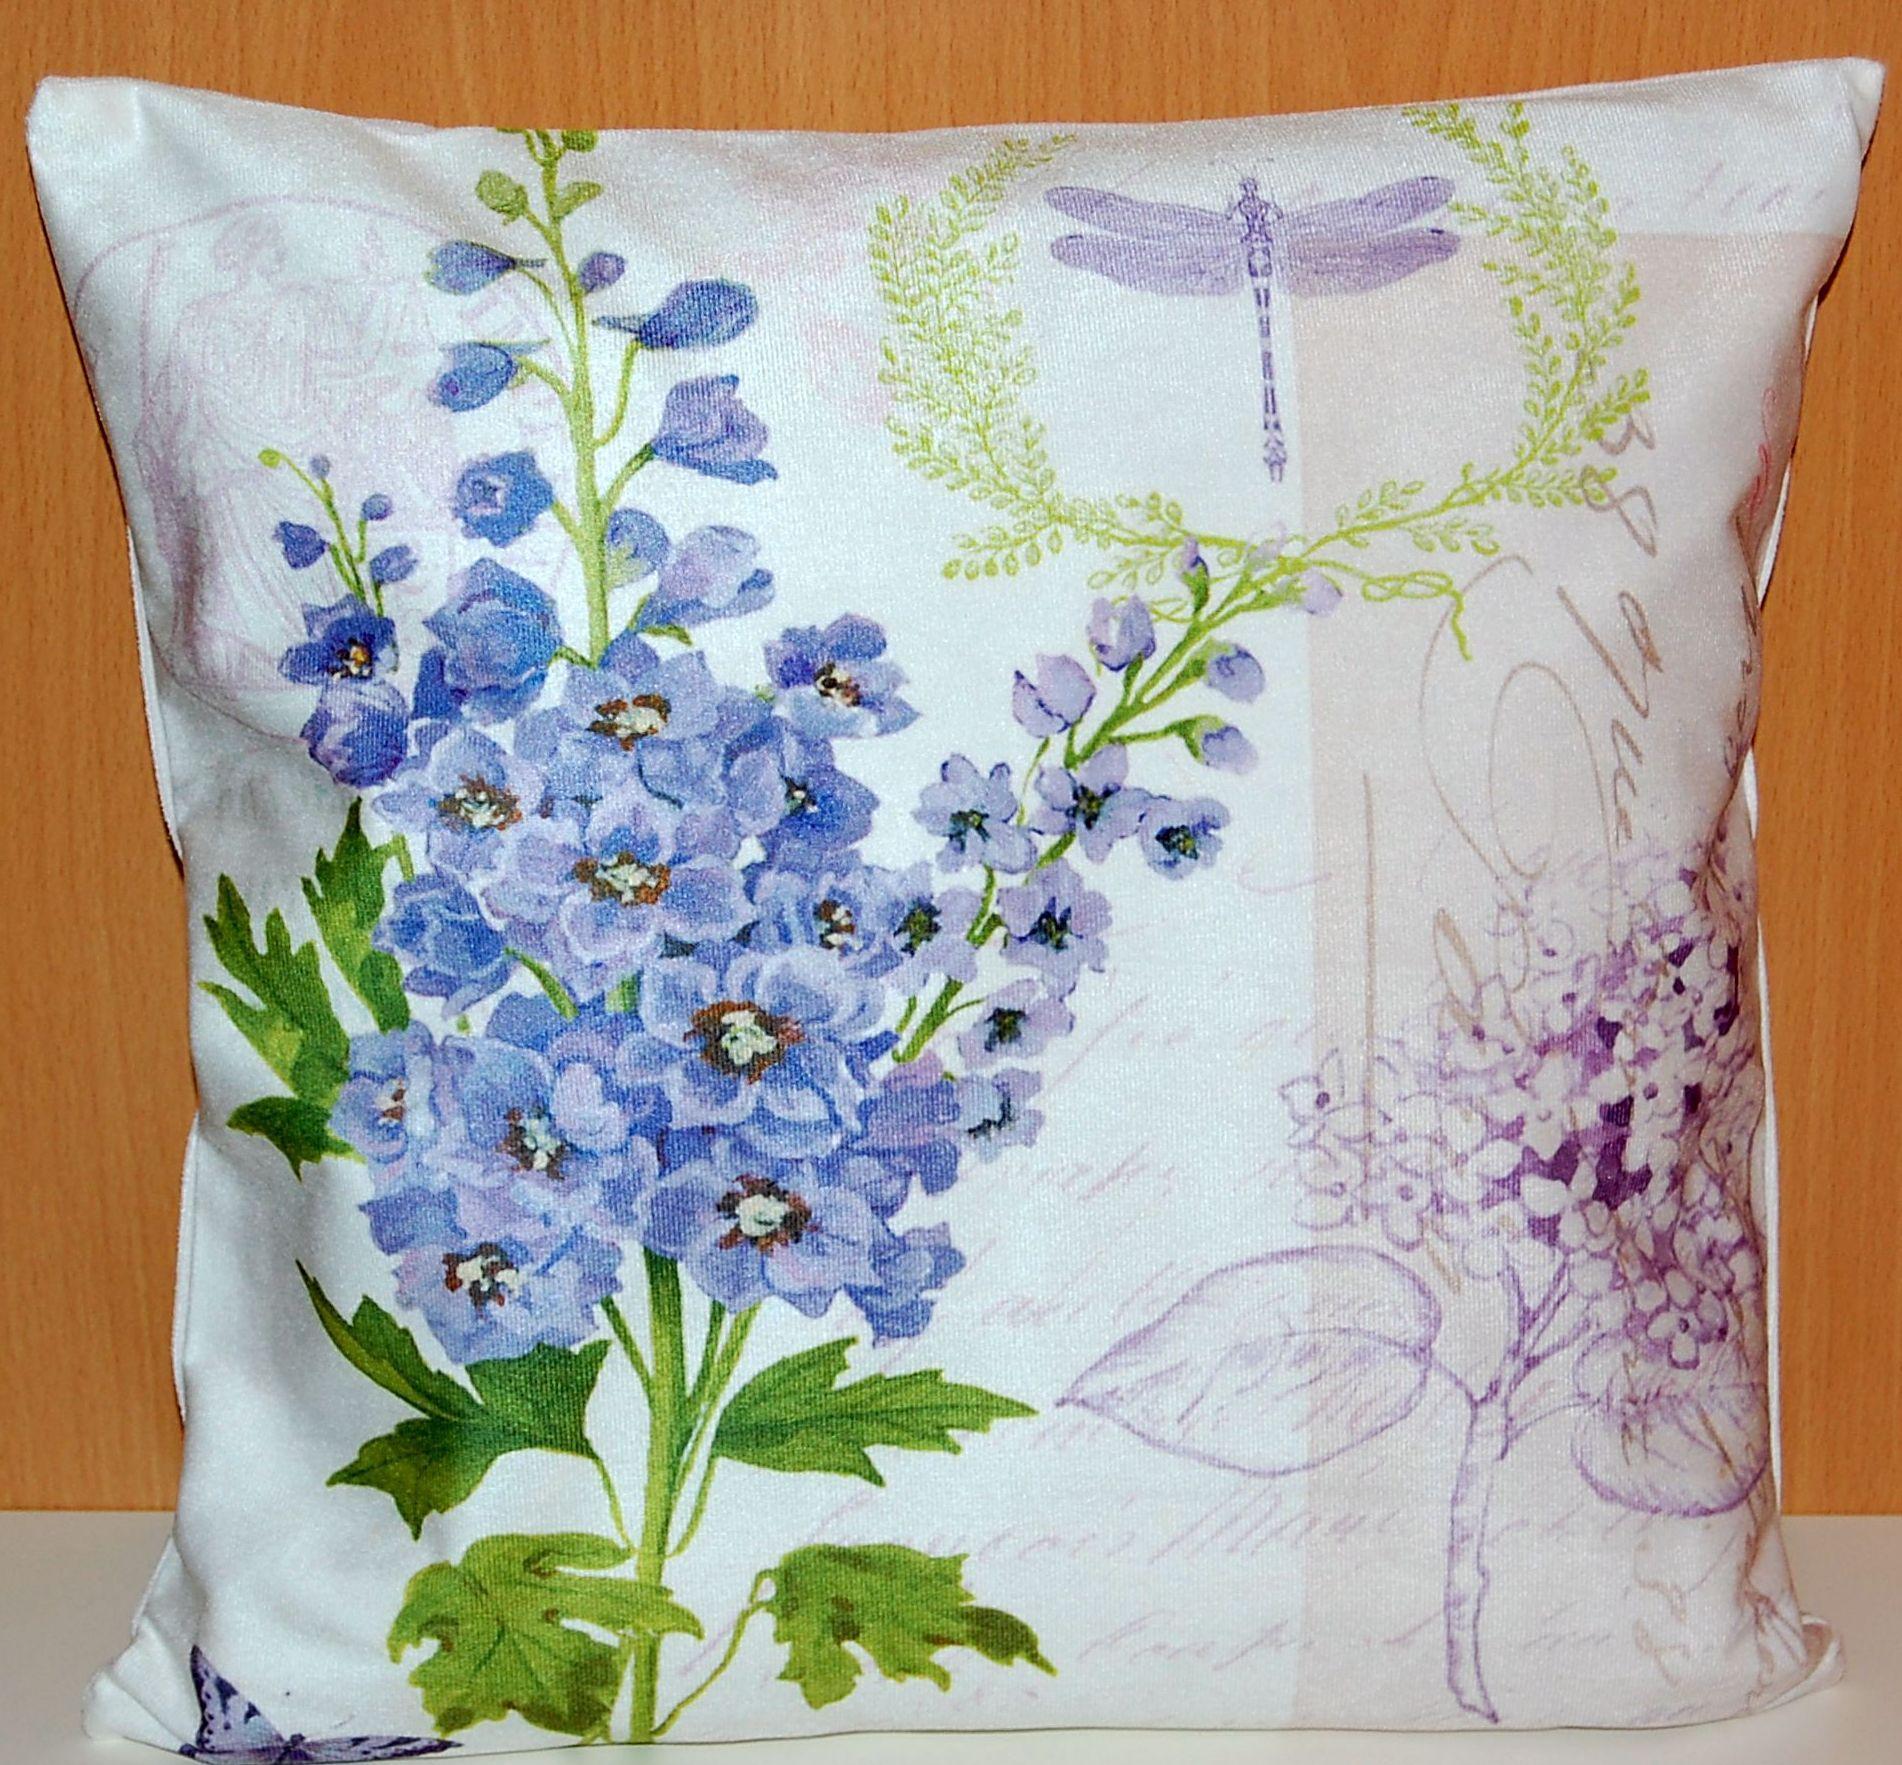 kissenh lle 40x40 cm soft touch kissenbezug fotooptik blumen bunt sofa lounch ebay. Black Bedroom Furniture Sets. Home Design Ideas